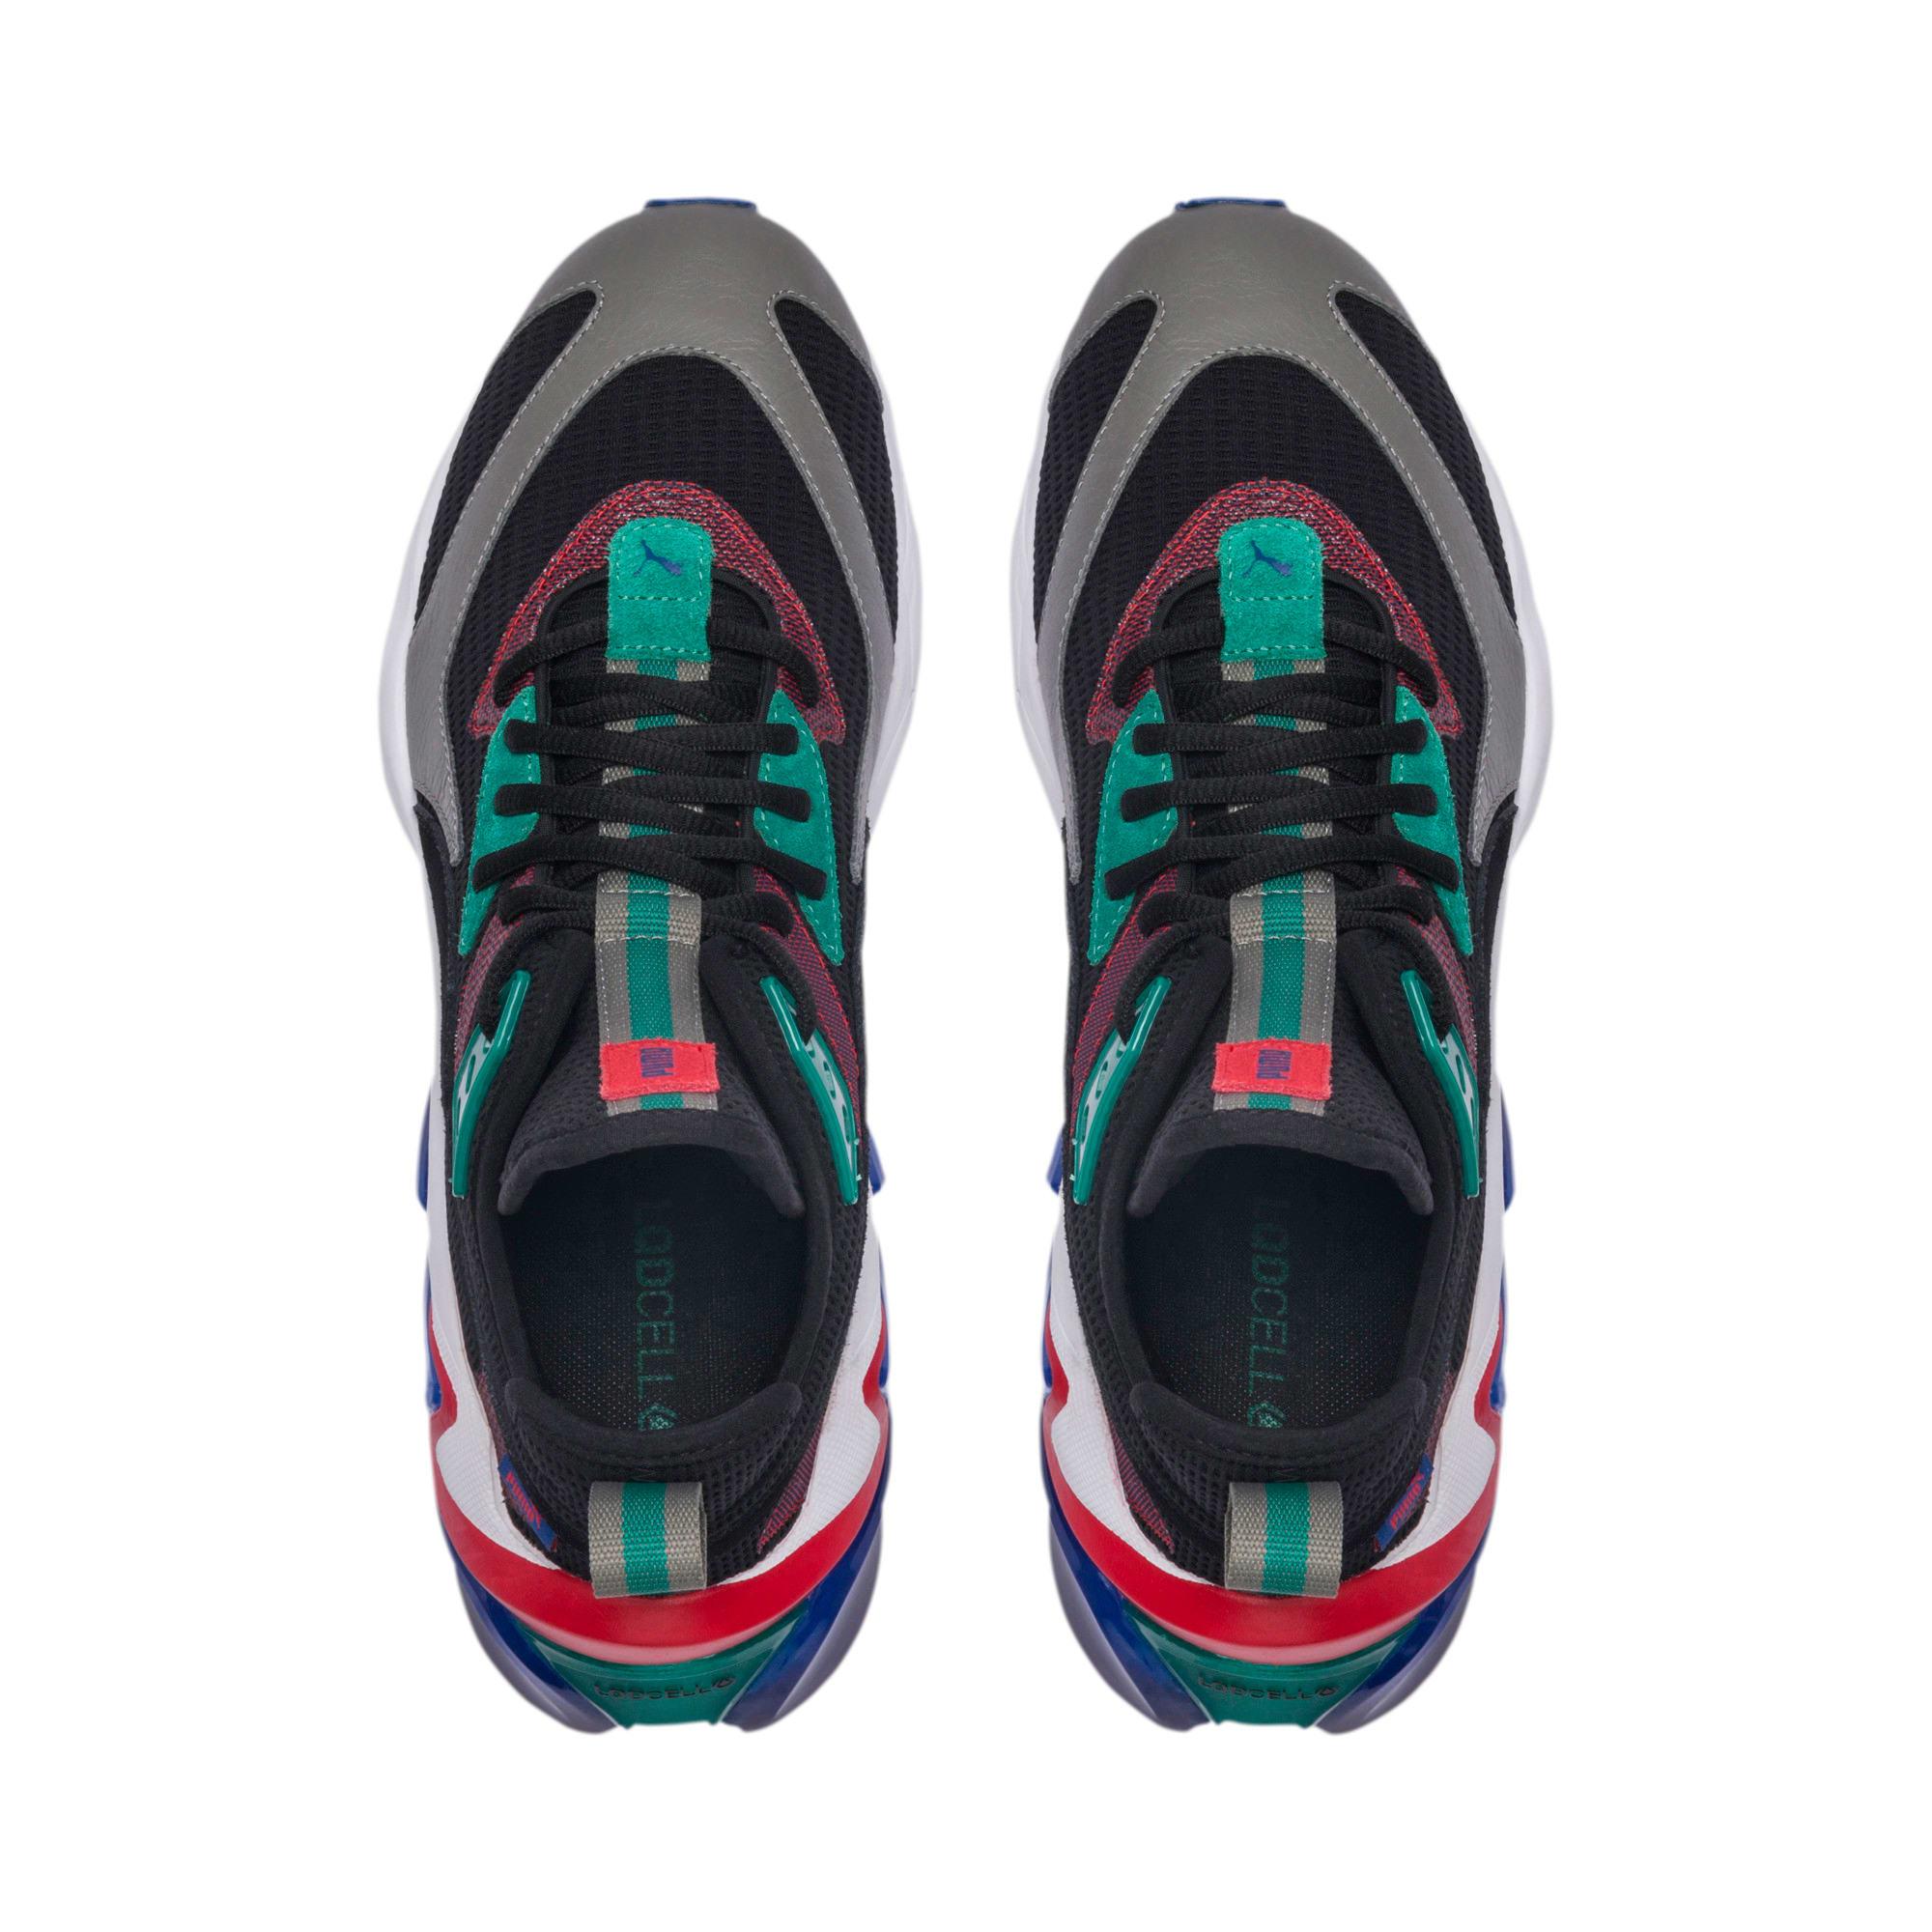 Thumbnail 6 of LQDCELL Origin Herren Sneaker, Puma Black-Cadmium Green, medium